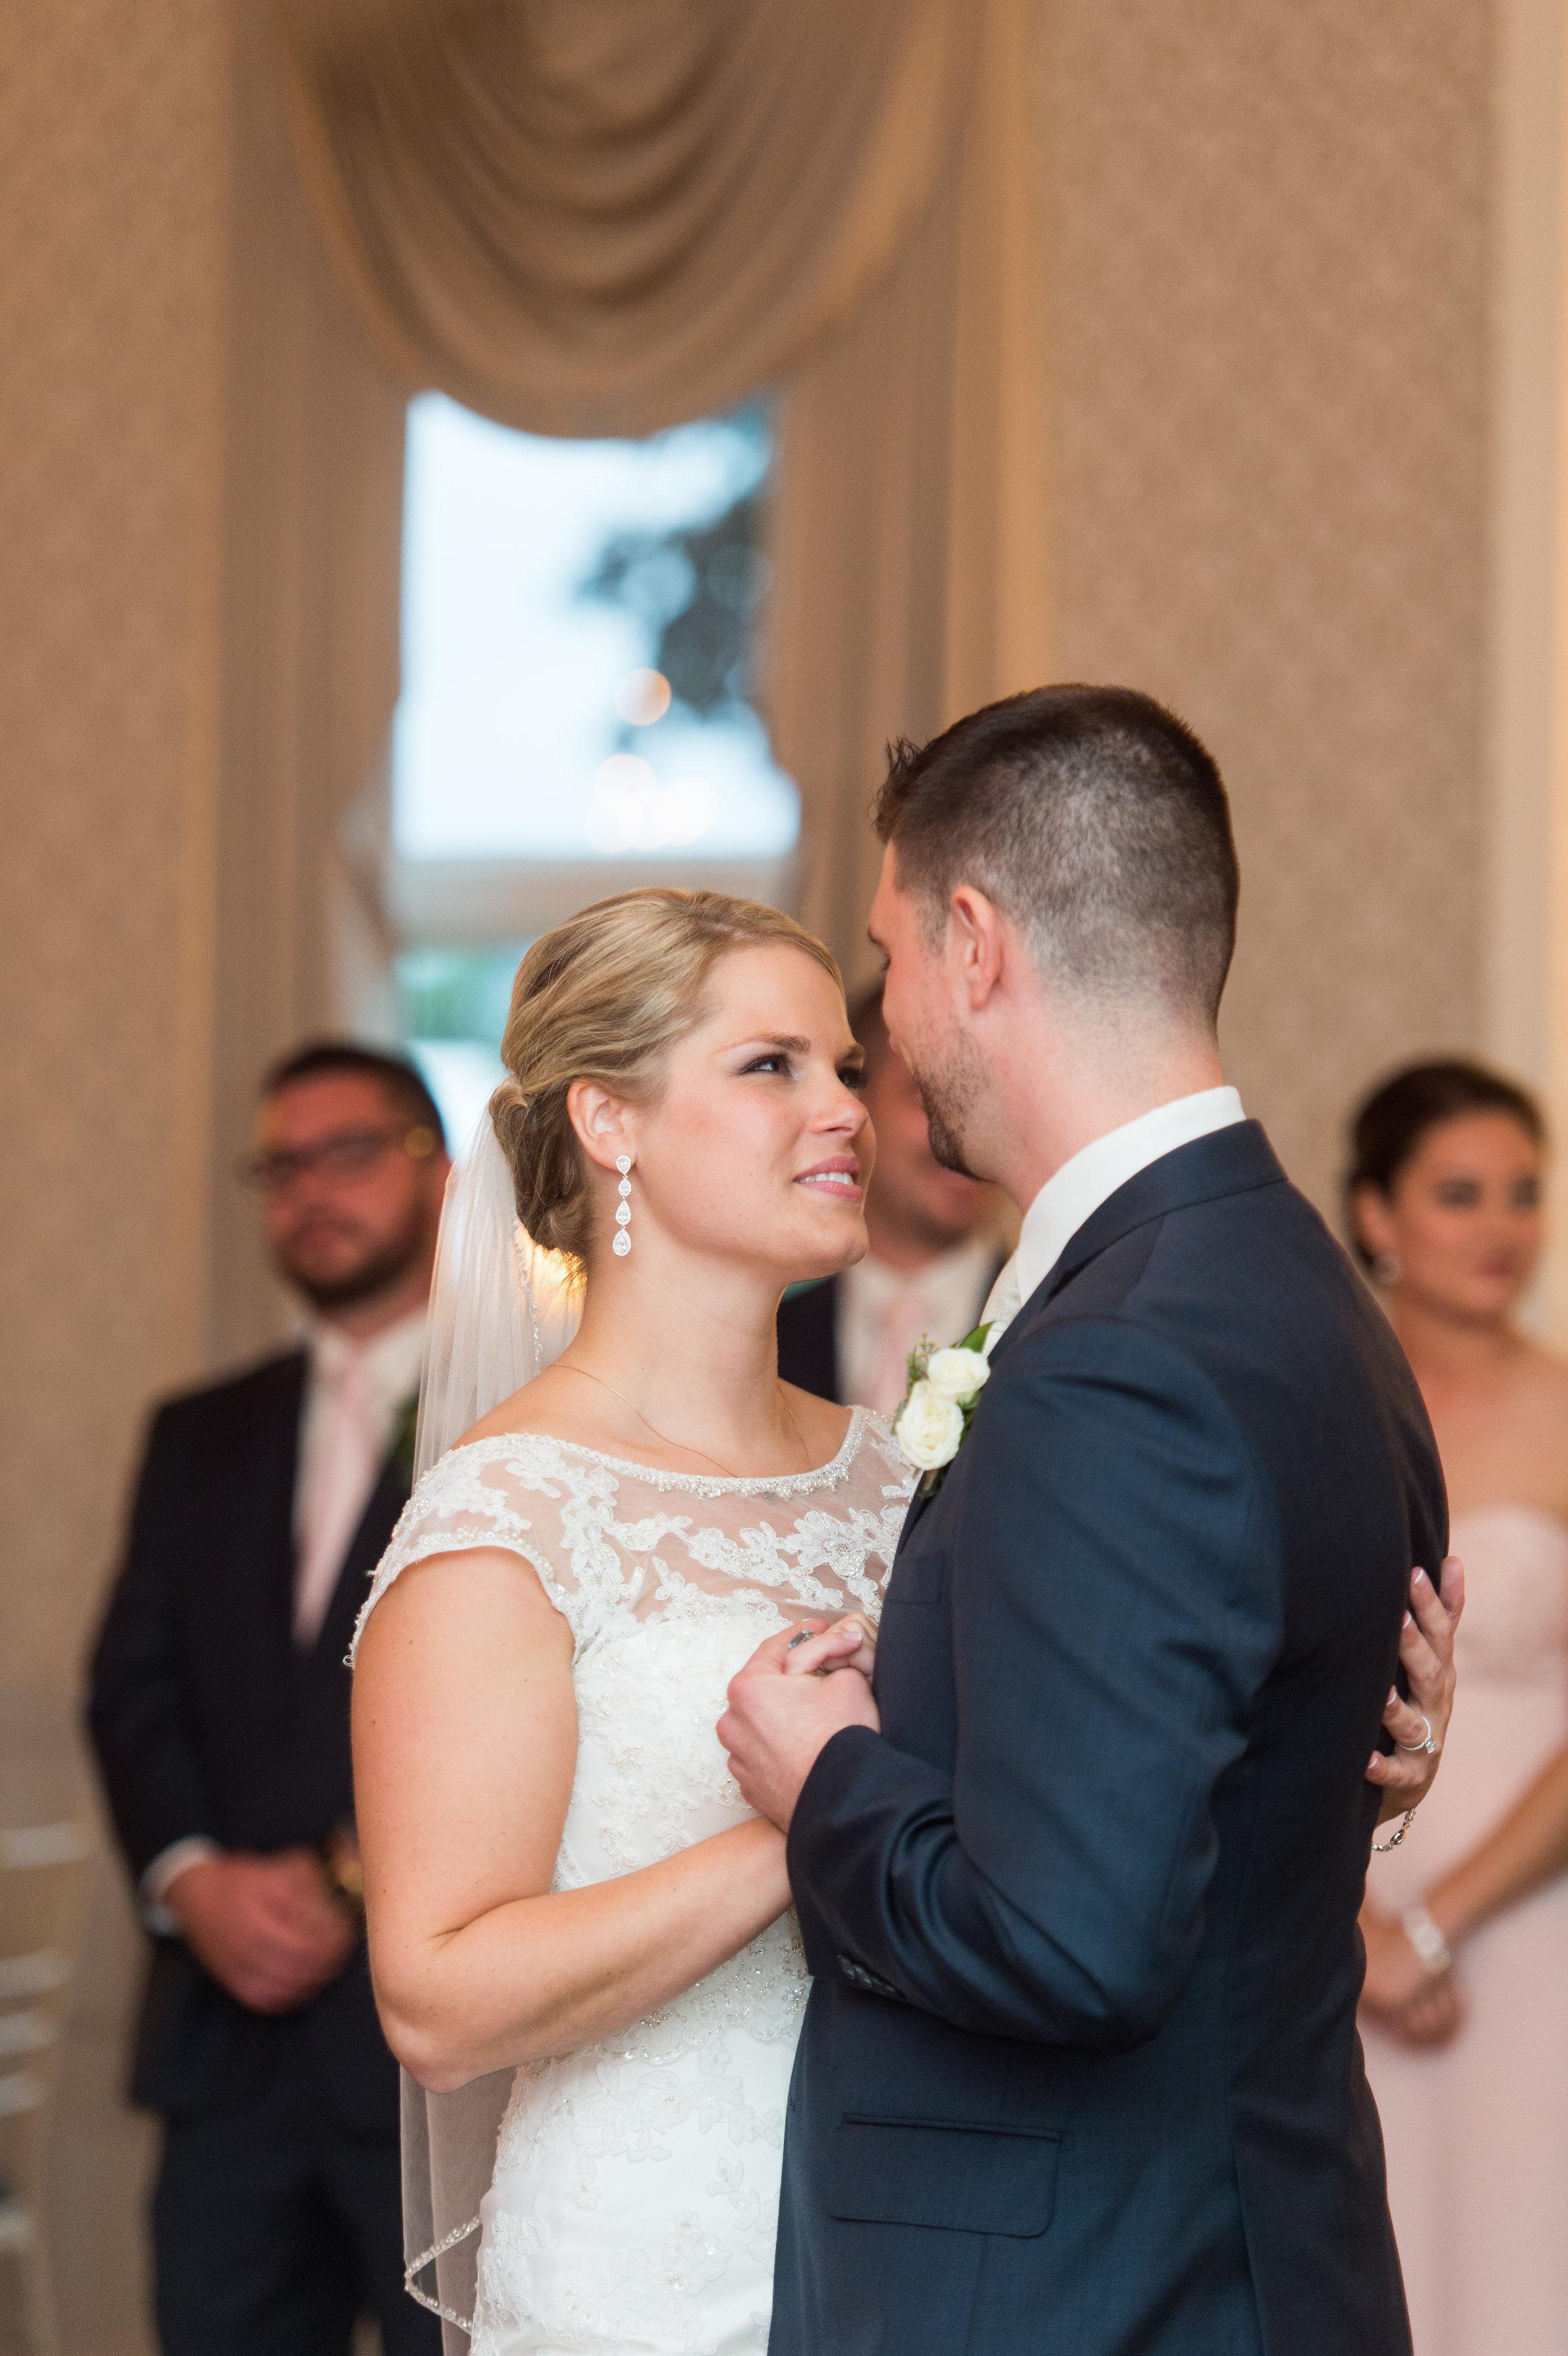 allegra_anderson_photography_ct_wedding_photographer_farmington_club_706